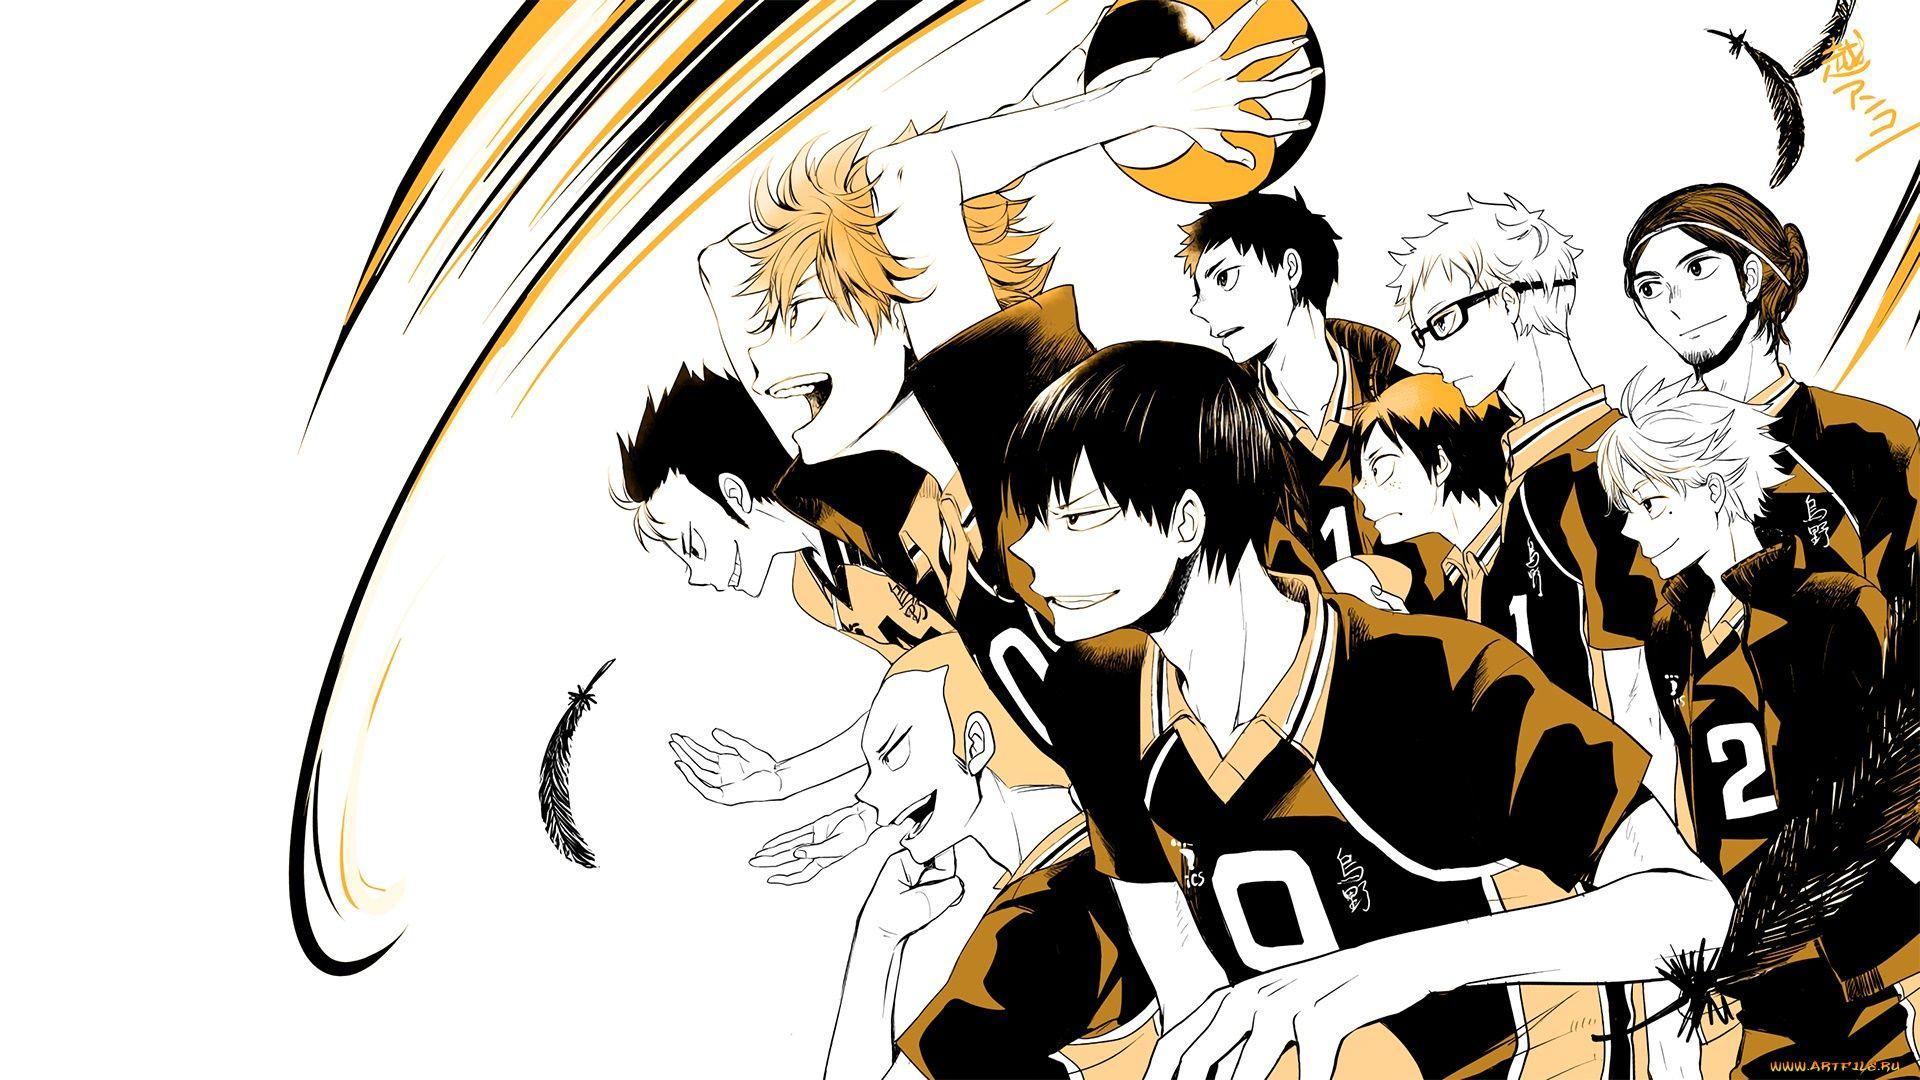 Anime Volleyball Haikyuu!! Wallpapers